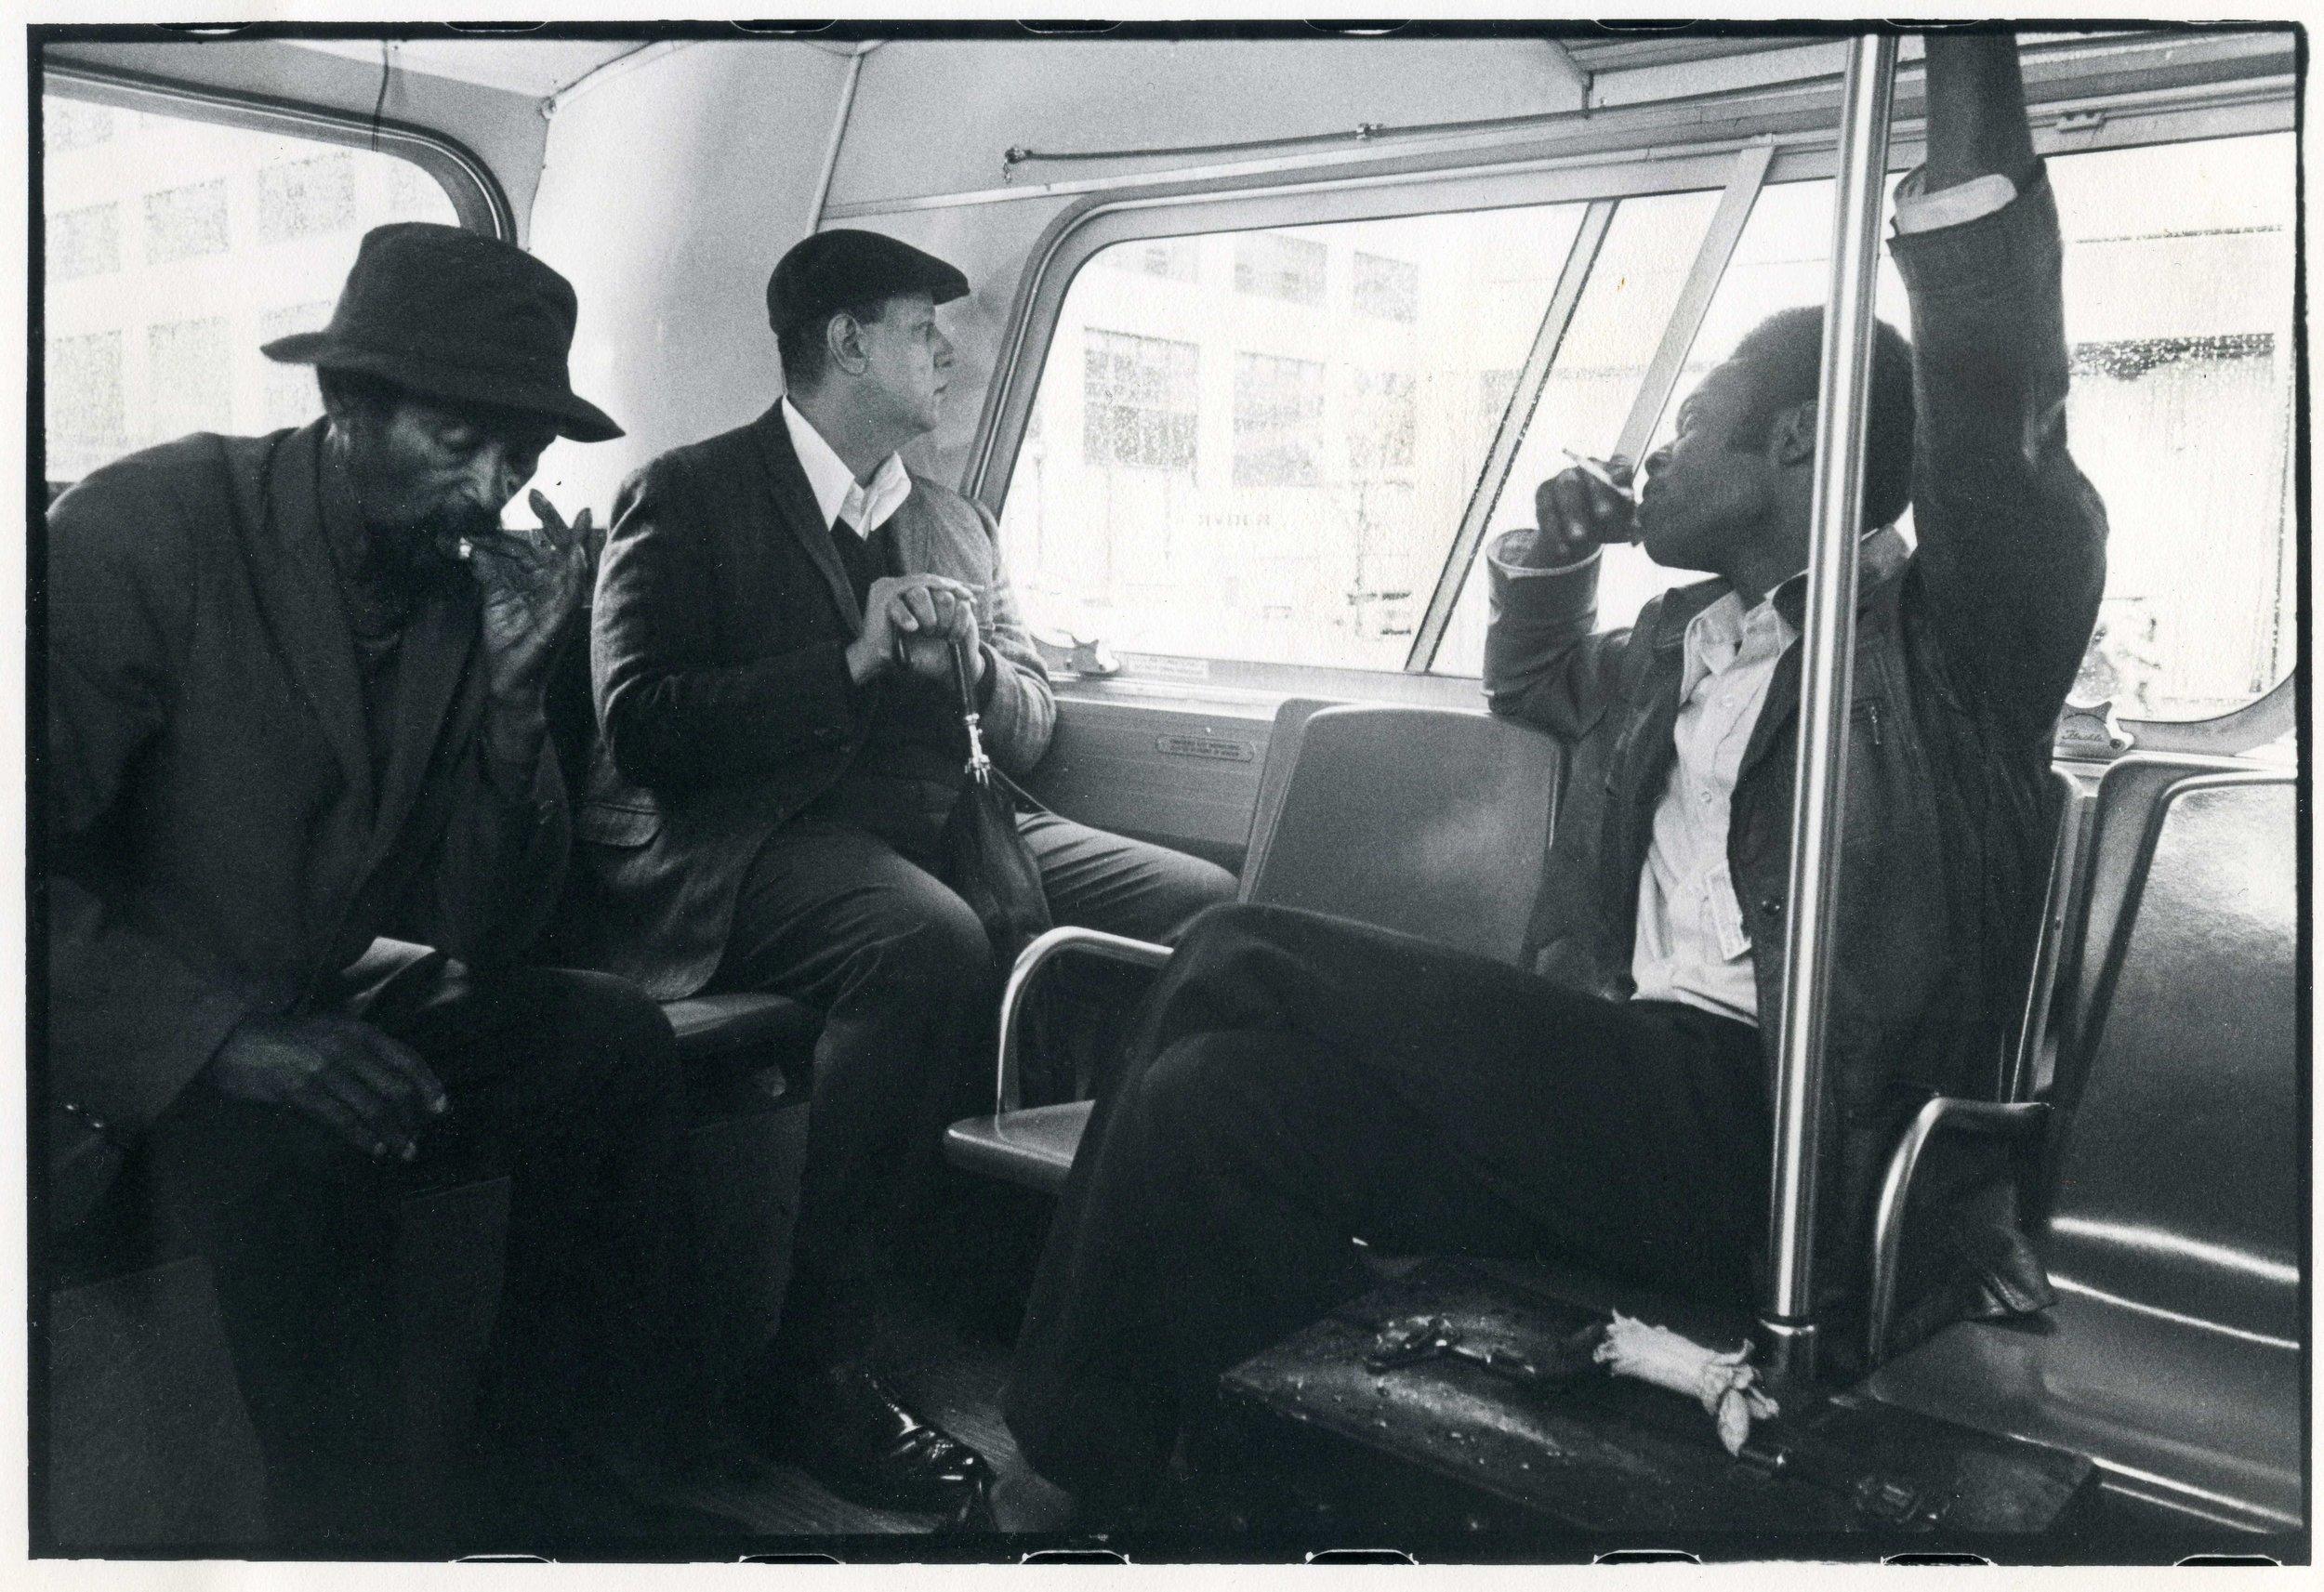 Men On Bus, New York City 1976